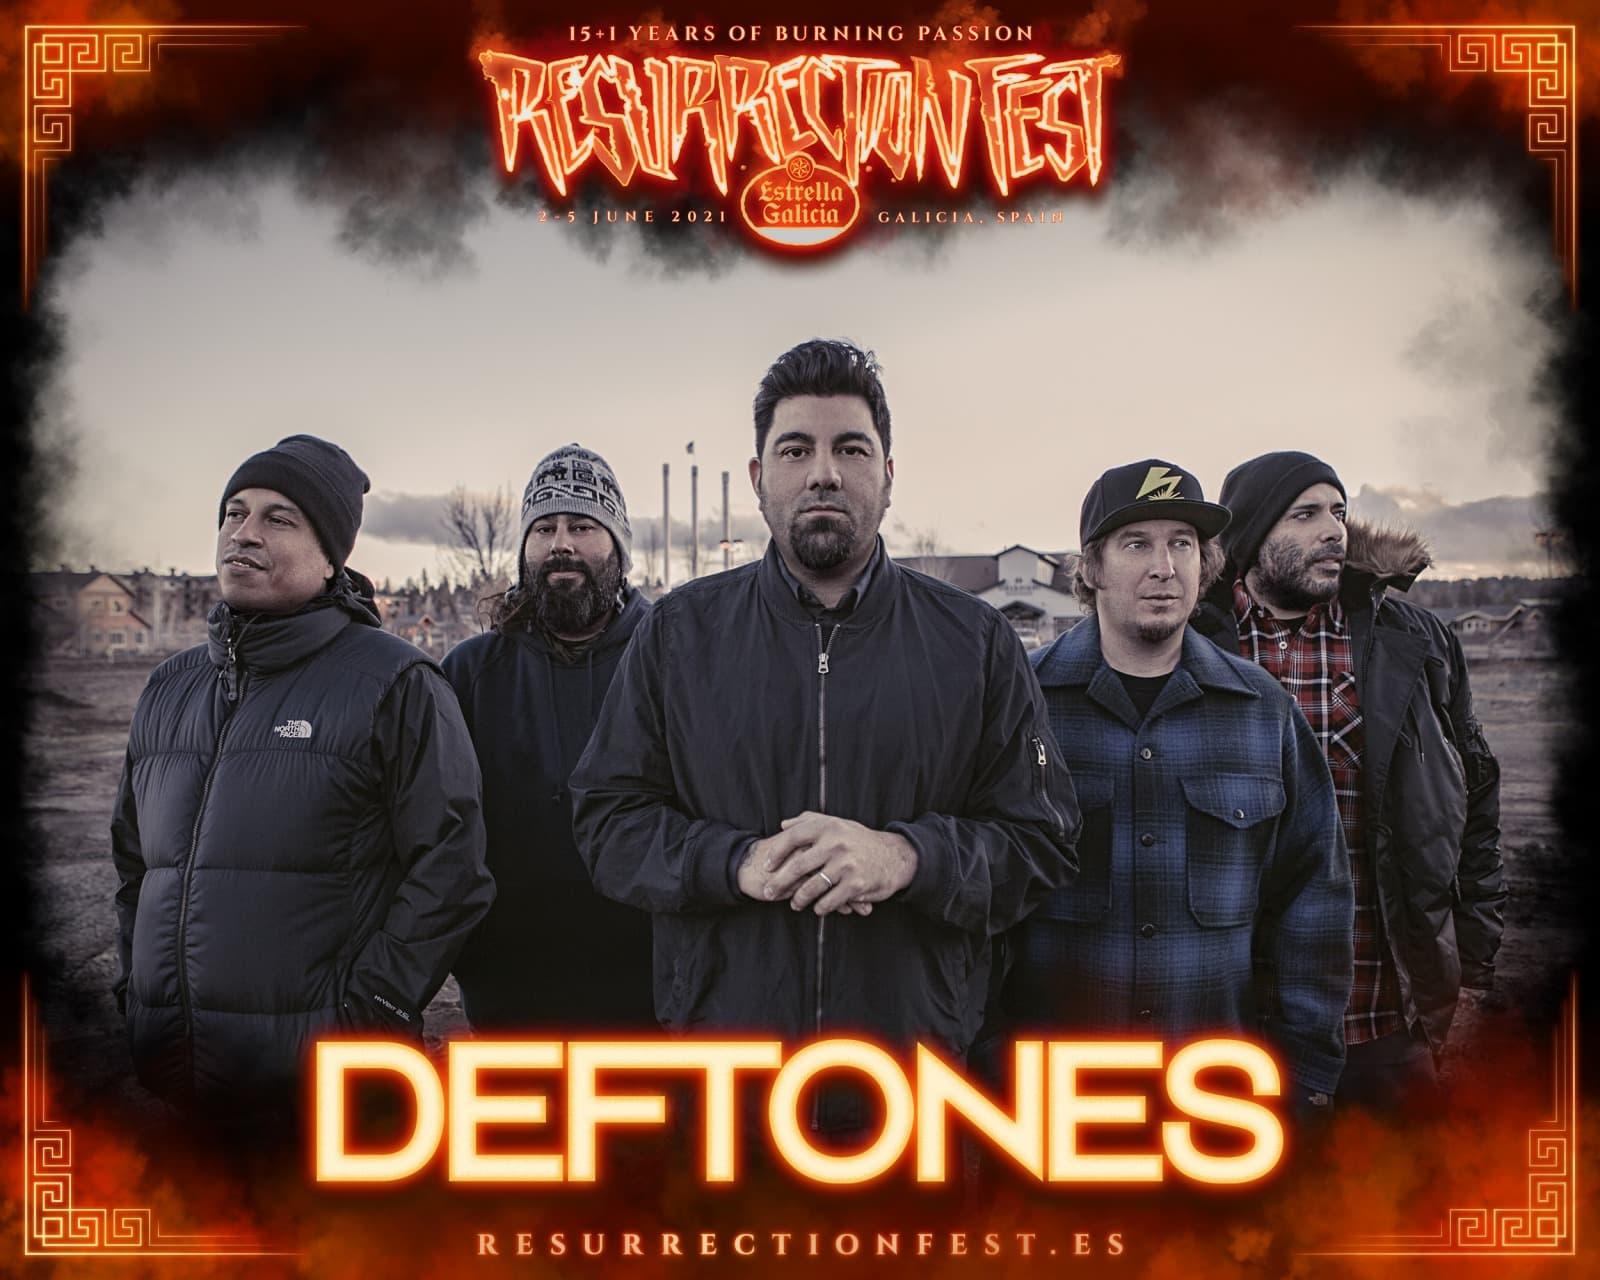 Deftones Resurrection Fest 2021